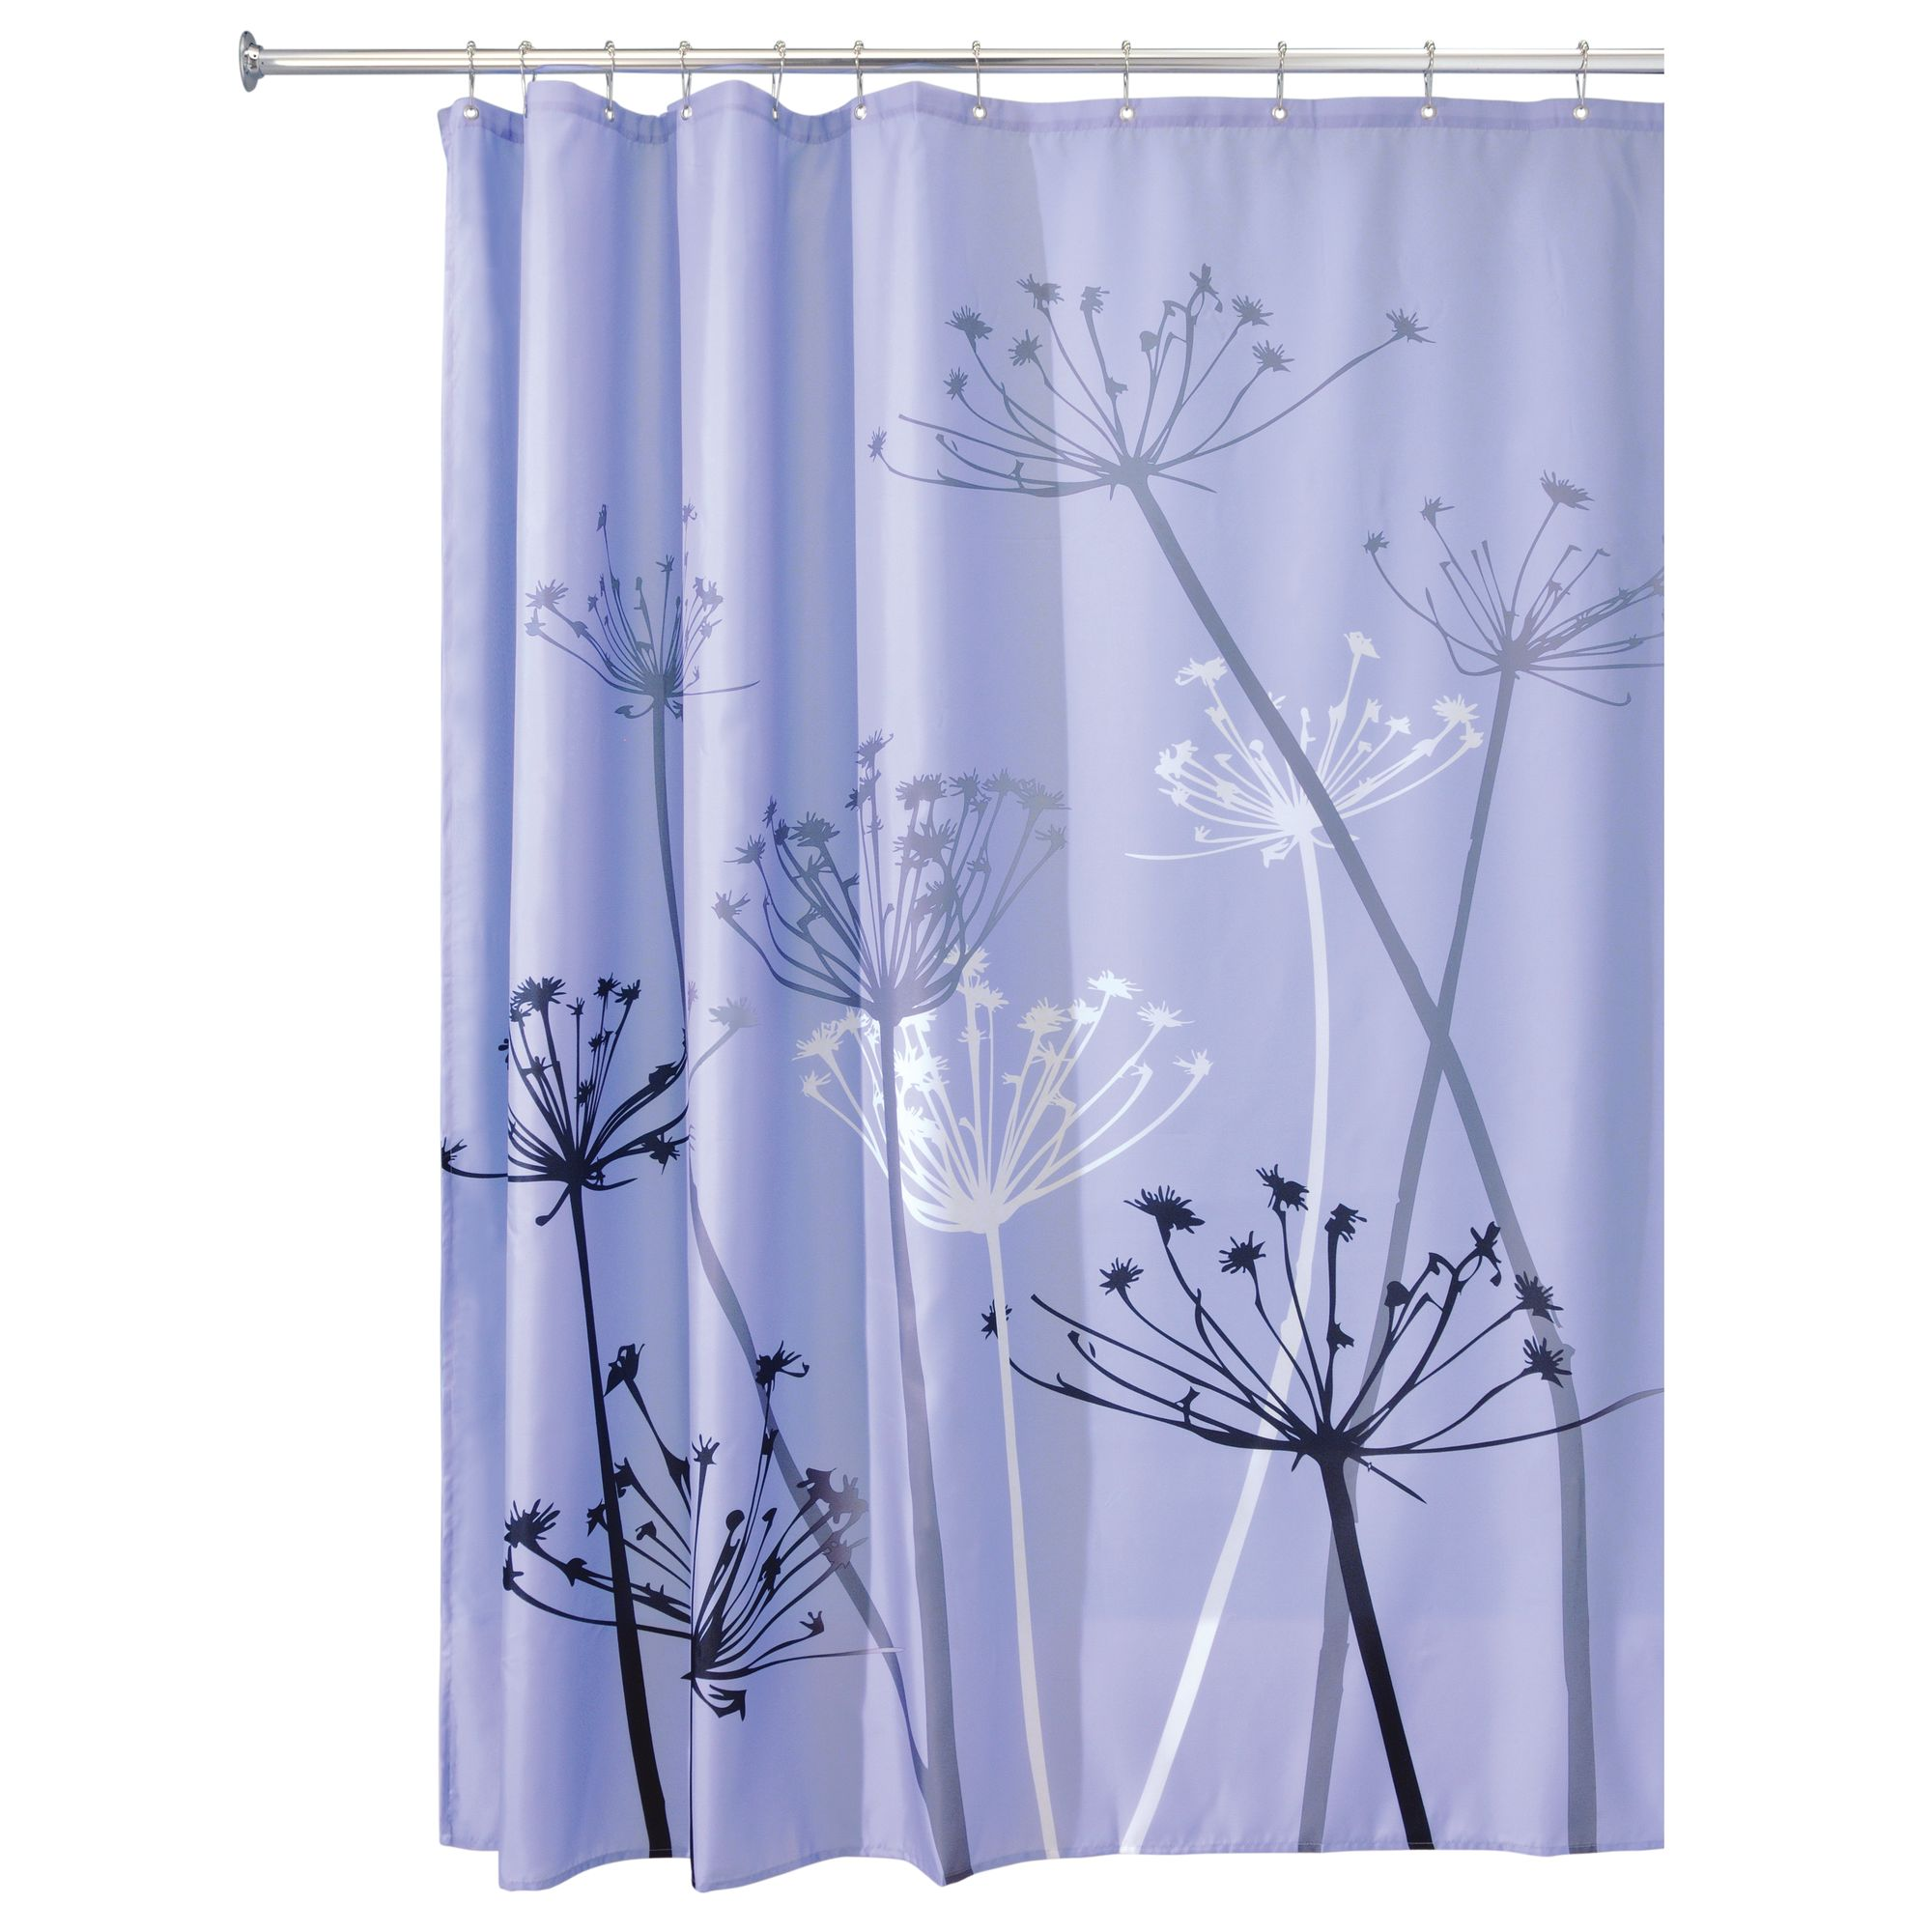 interdesign thistle fabric shower curtain standard 72 x 72 purple gray